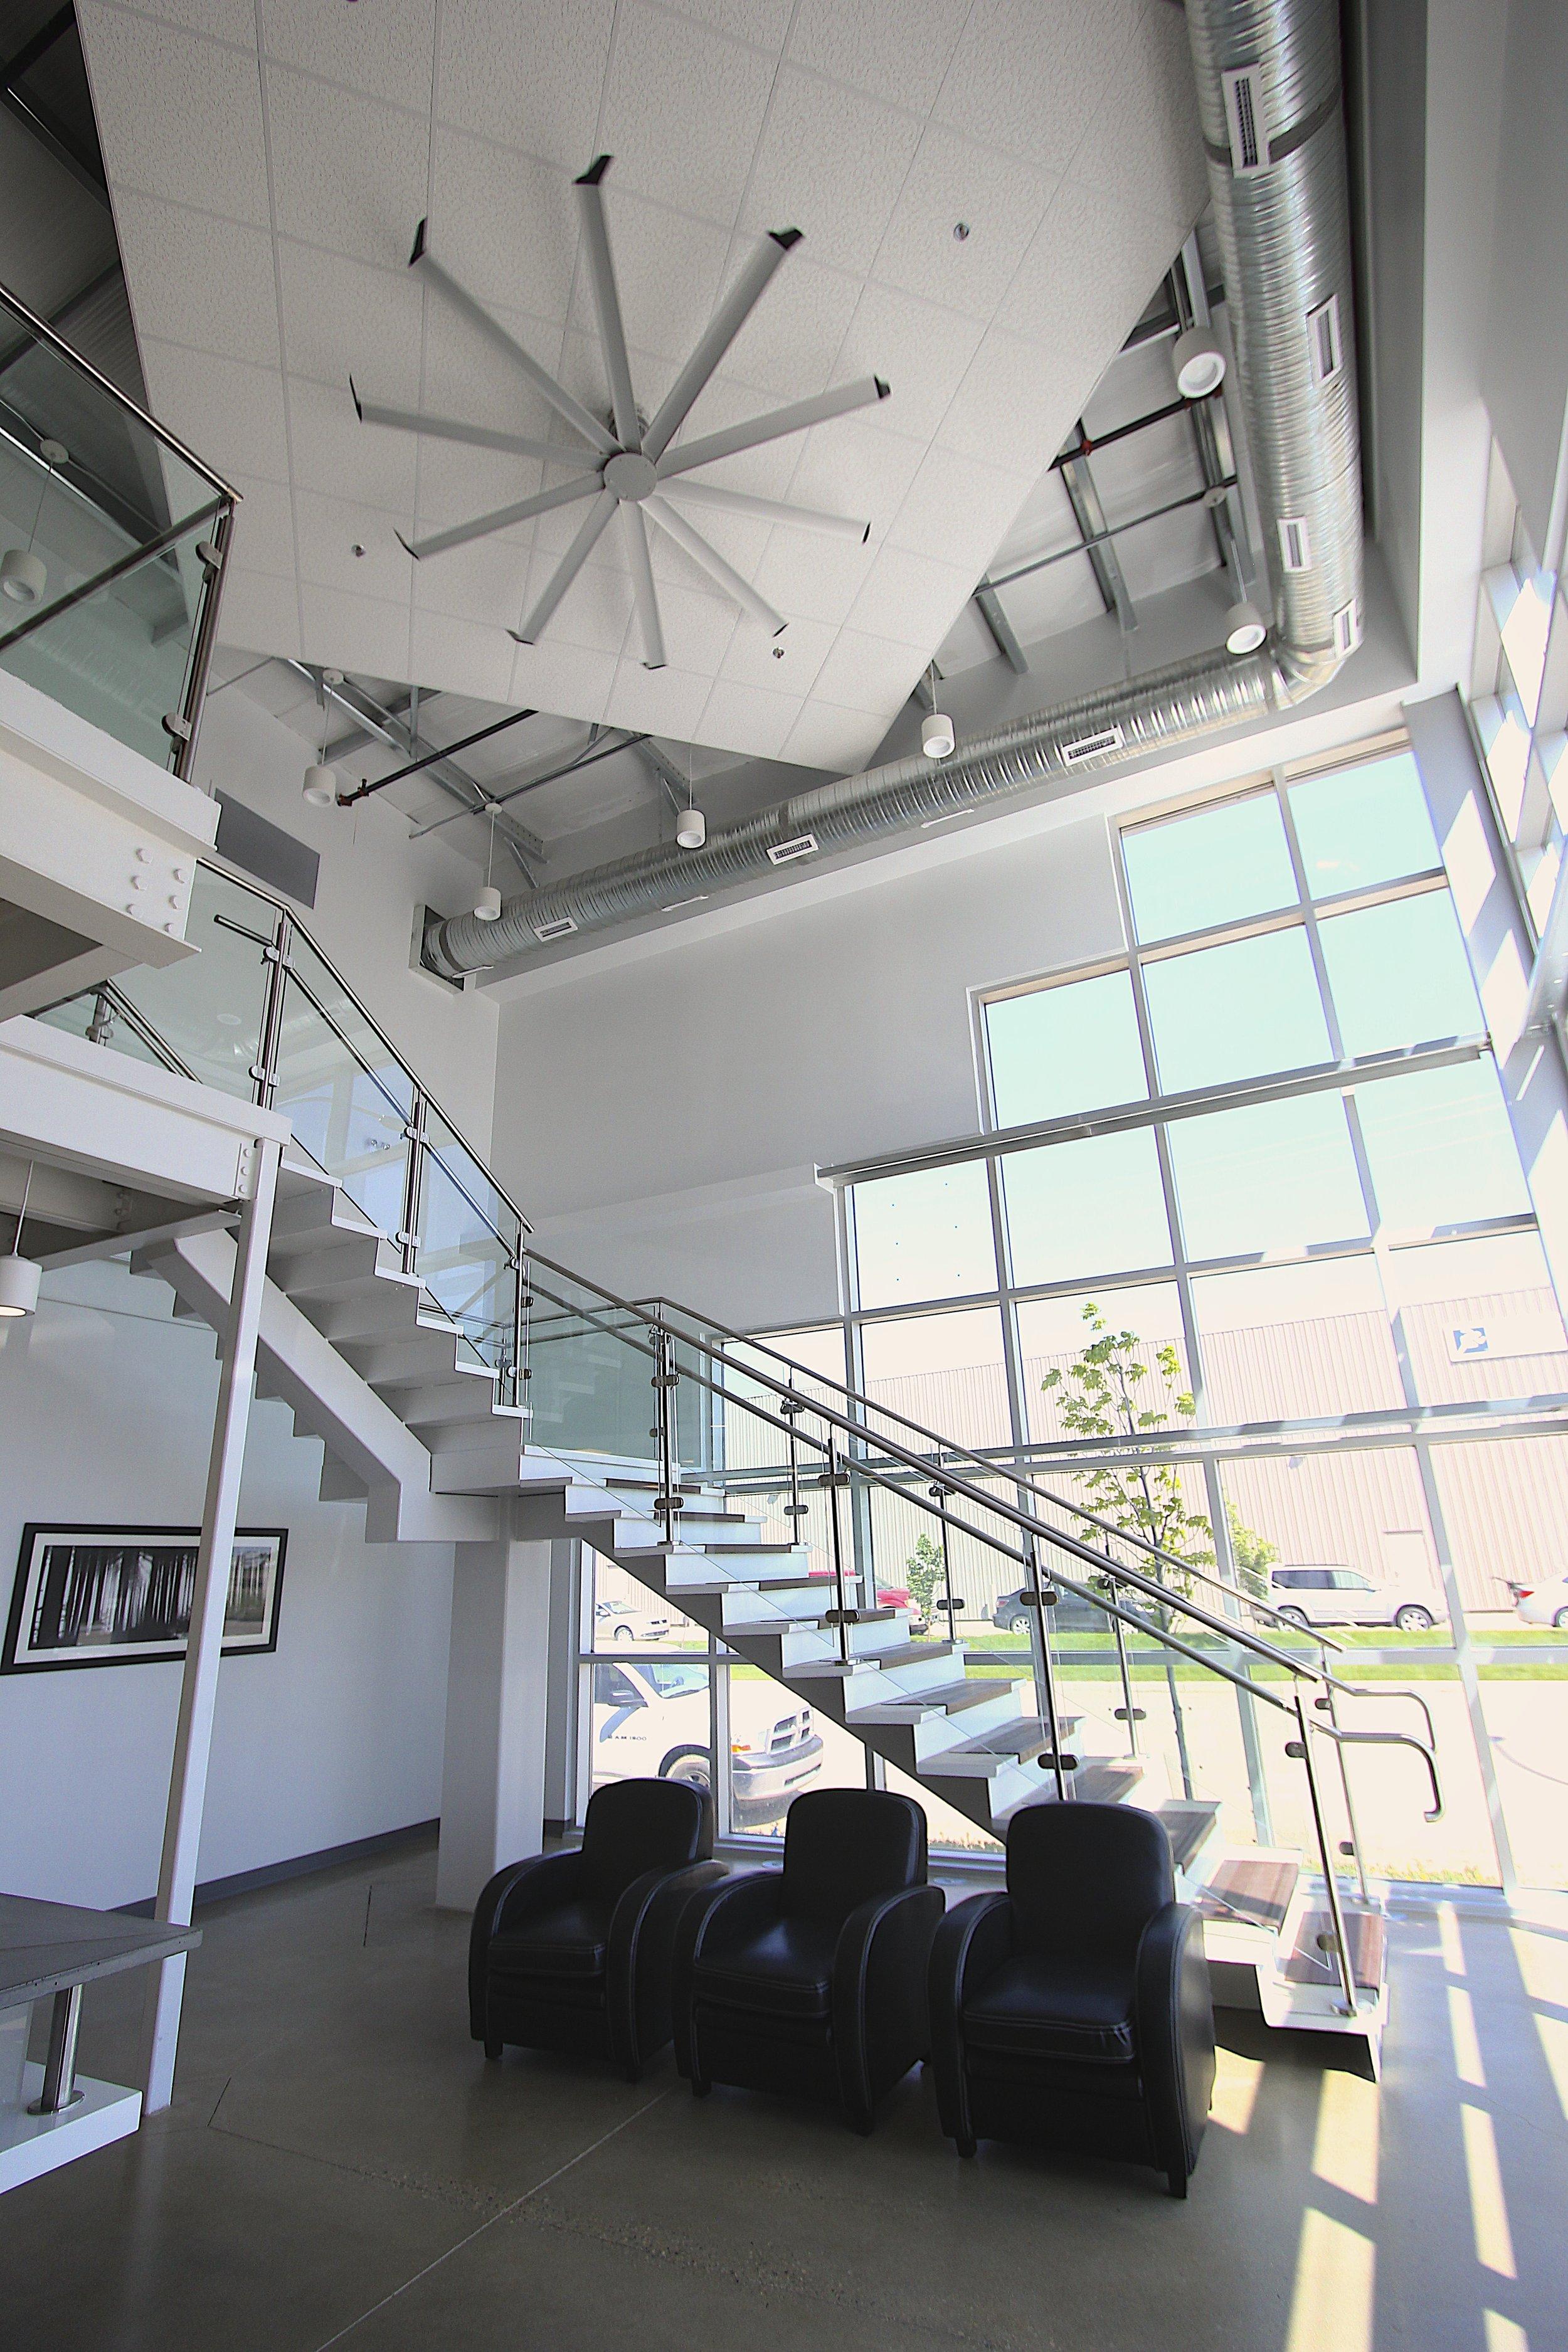 Metric Design, Saskatoon, Interior Design, Renovations, Bulkhead, Exposed Ductwork, Commercial Staircase, Natrual Light.jpg